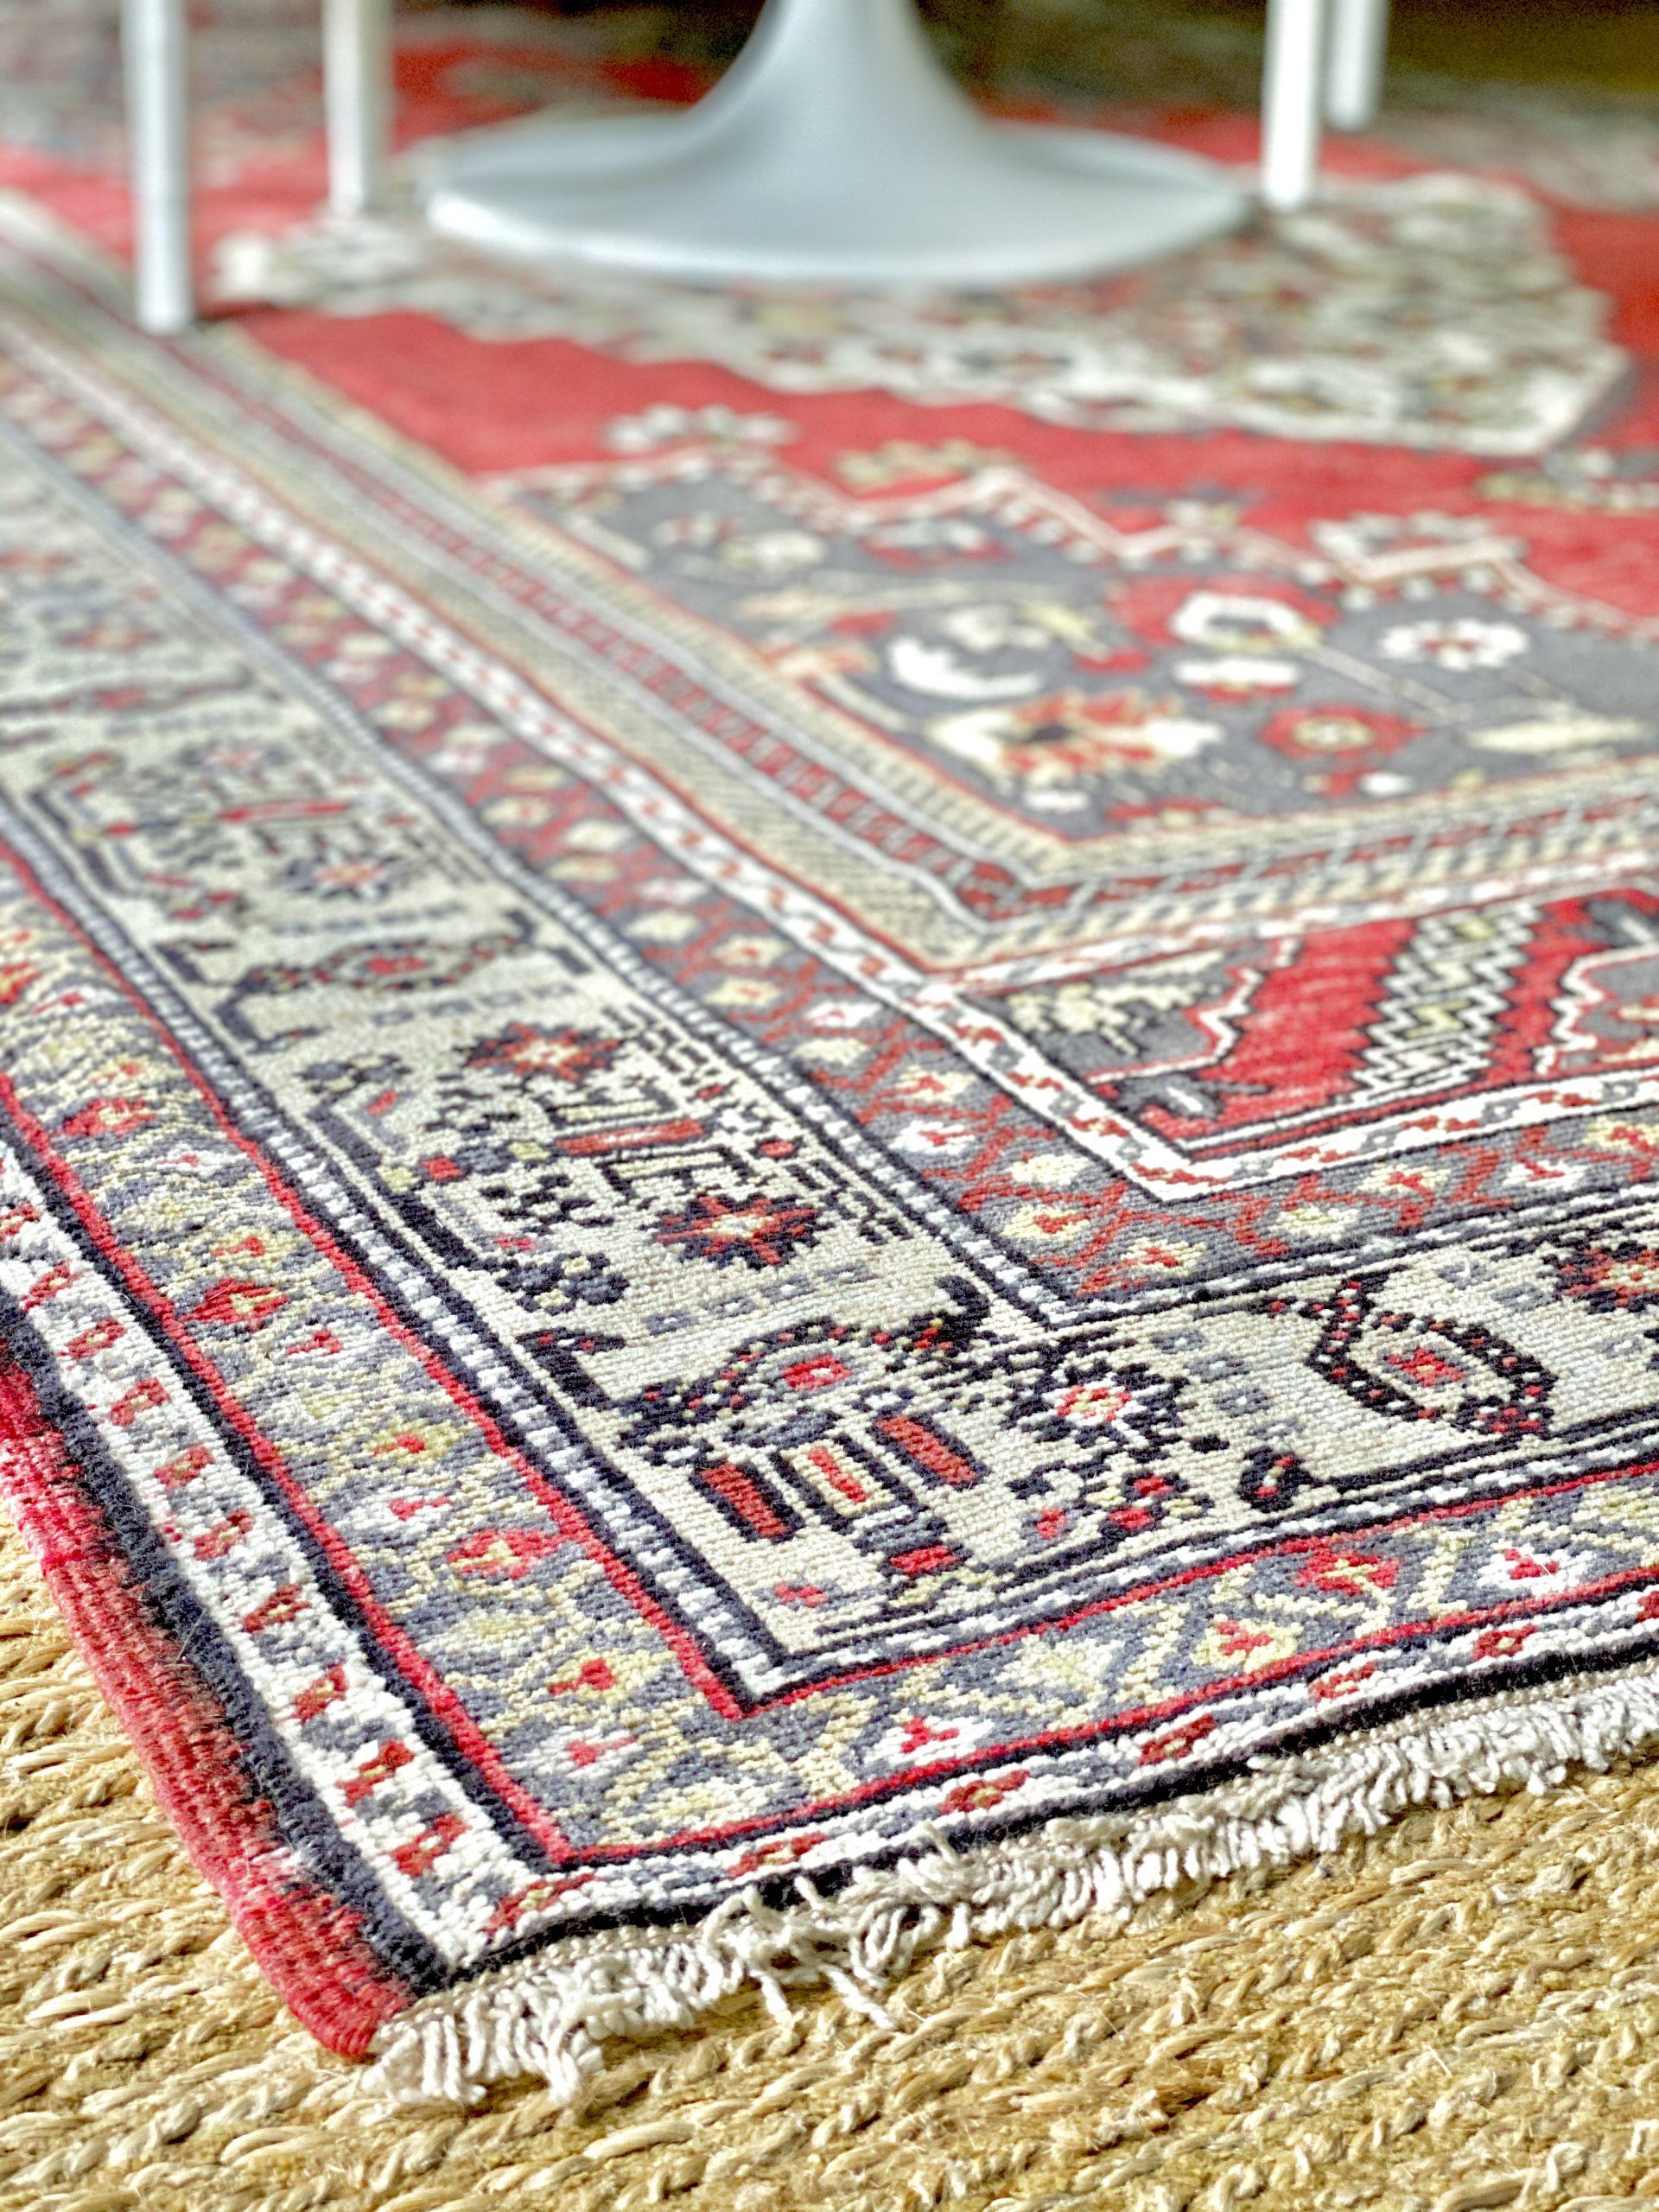 layering-vintage-turkish-rug-sisal